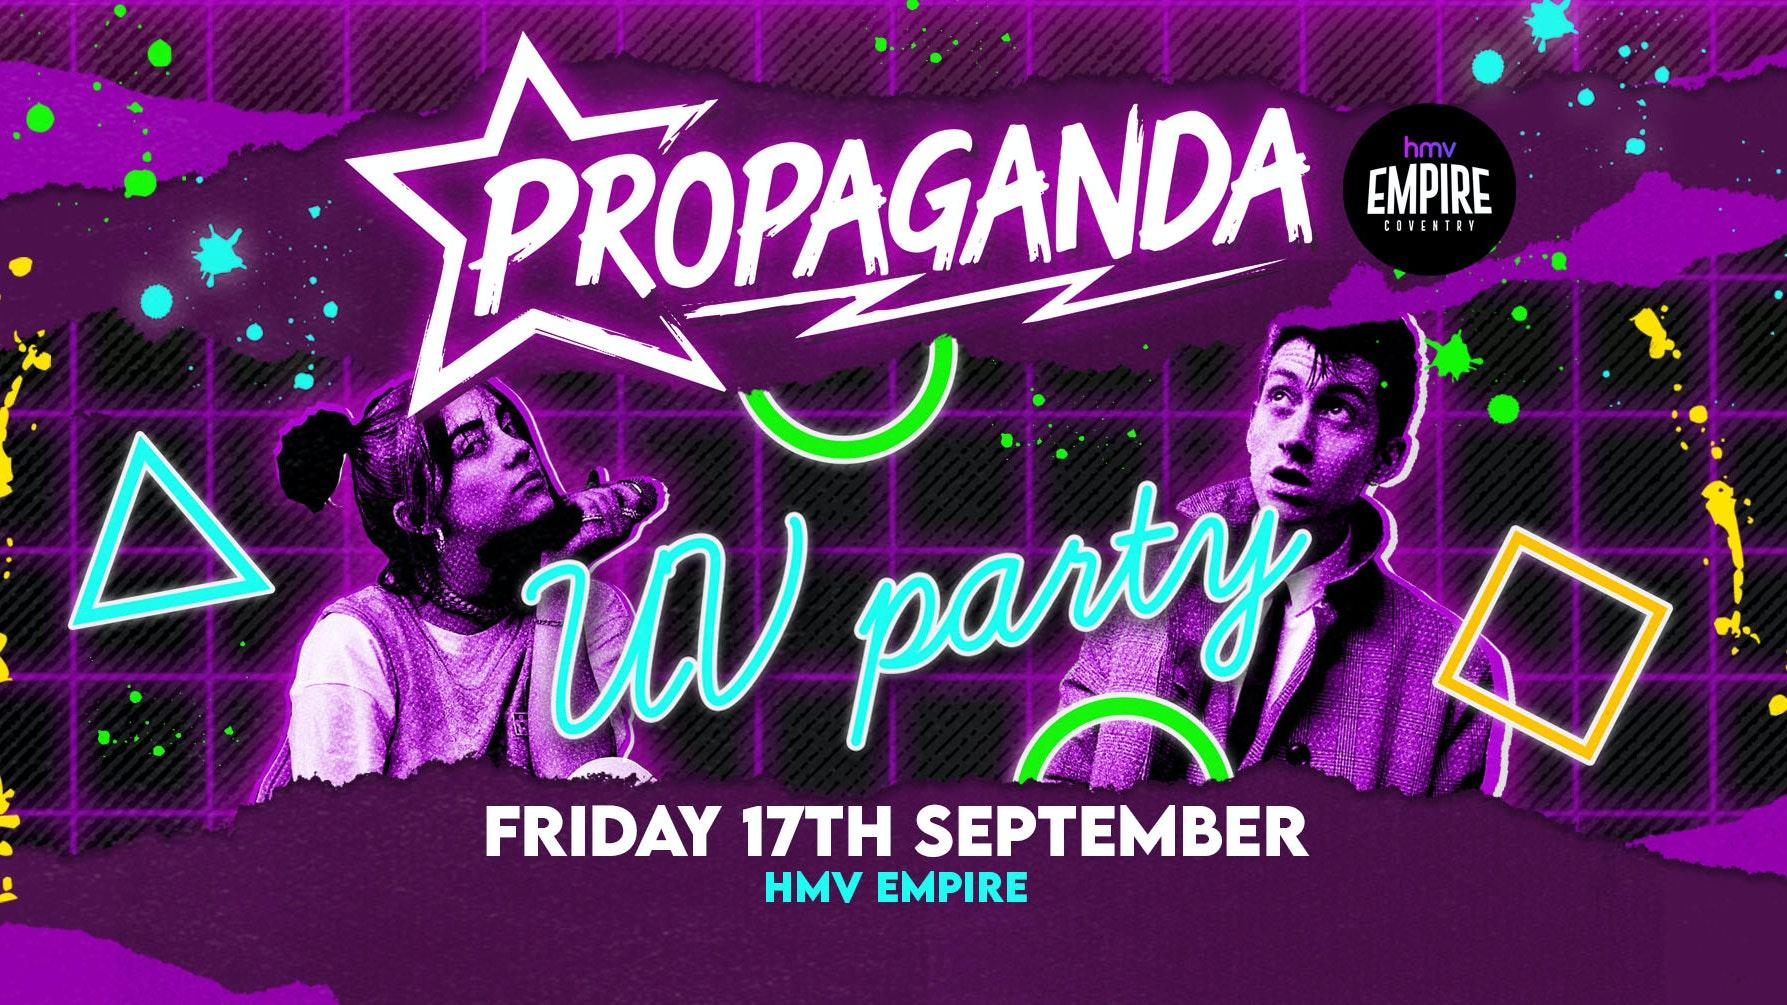 Propaganda Coventry –  UV Party!